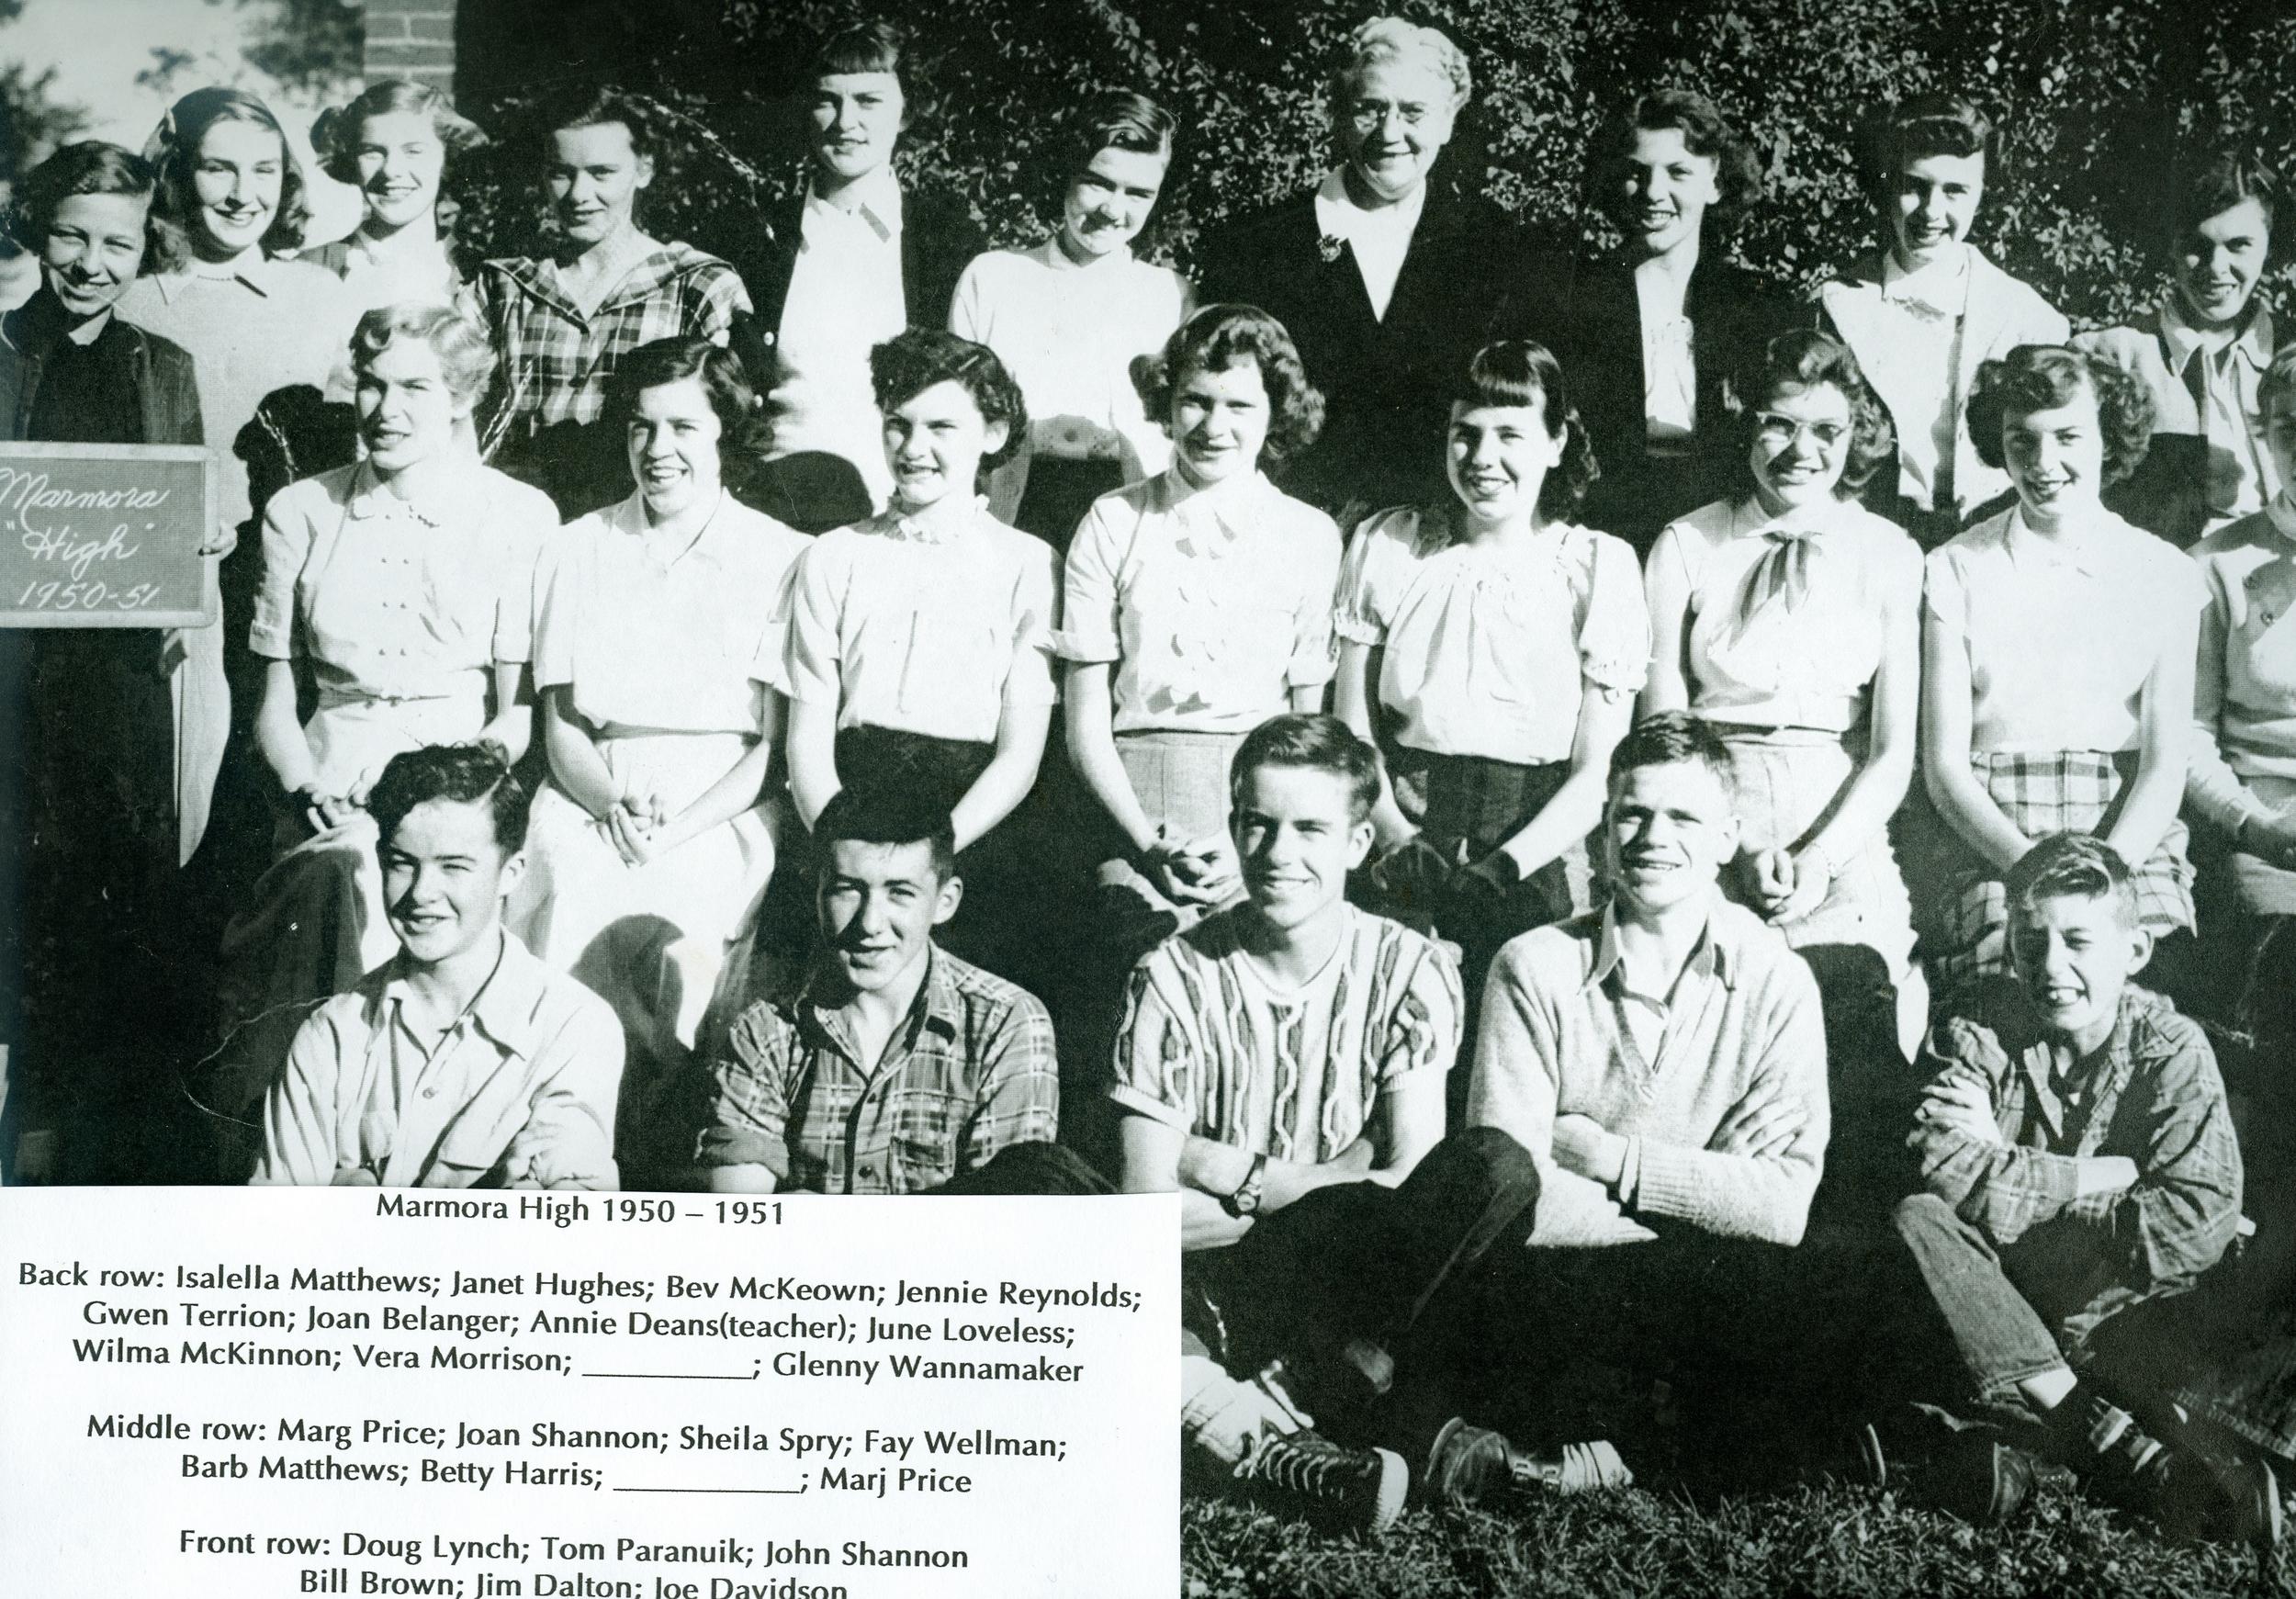 1950-1951 Marmora High School  (left side).jpg